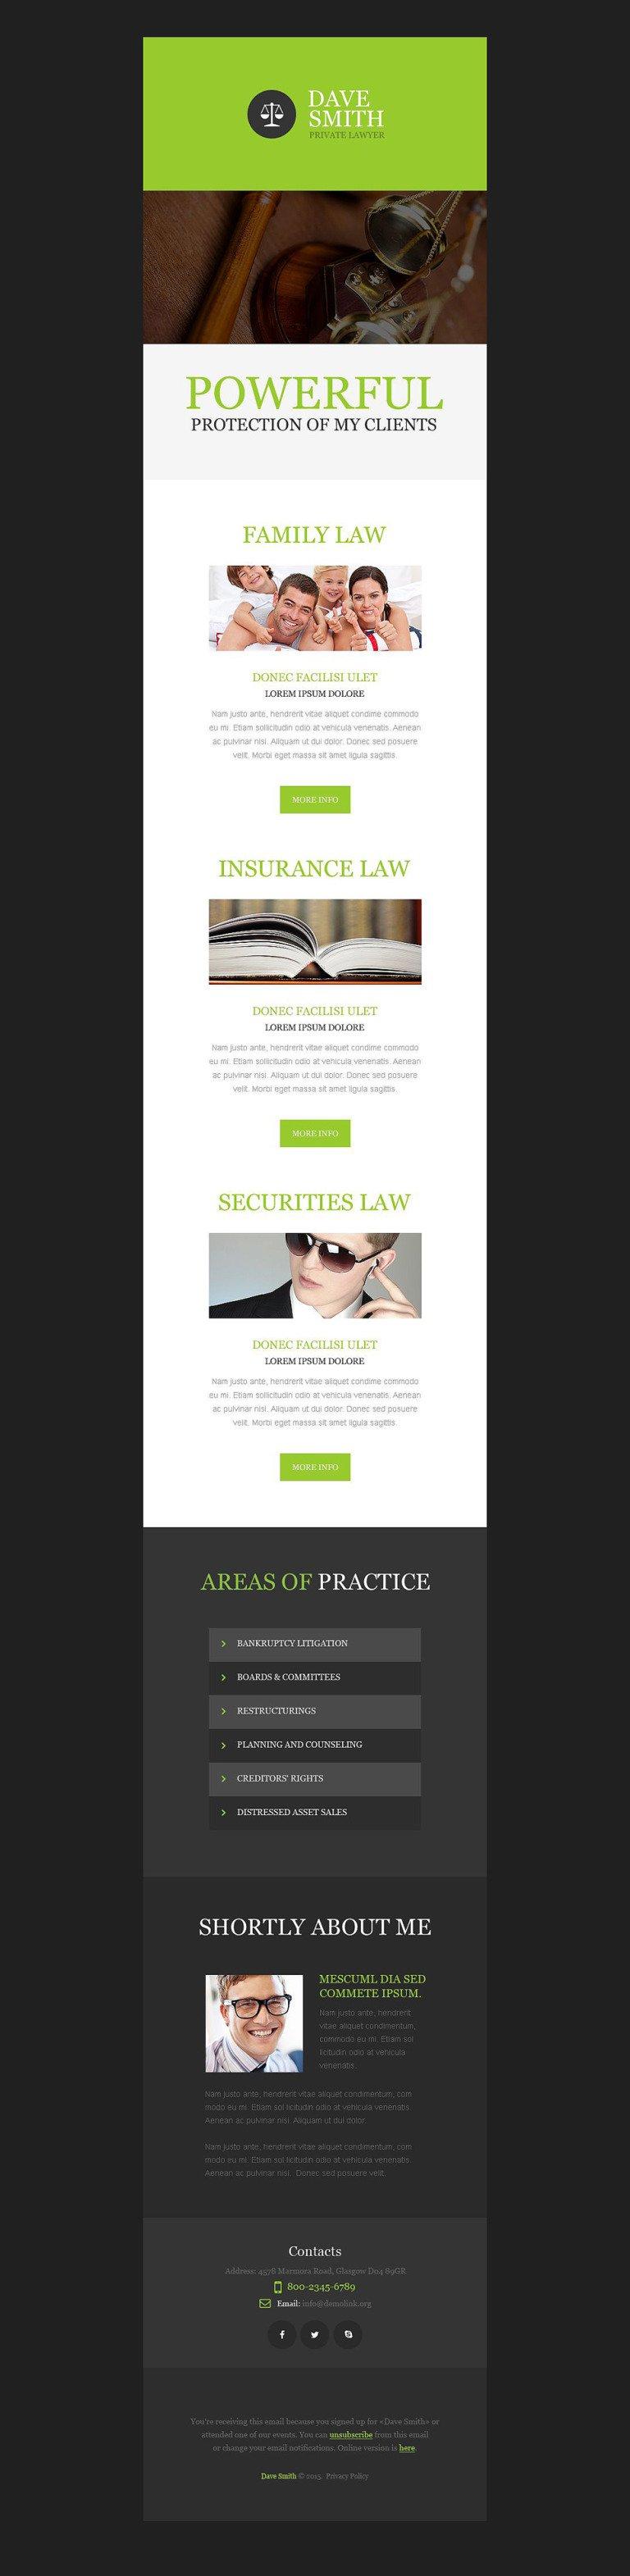 Law Firm Newsletter Template New Screenshots BIG